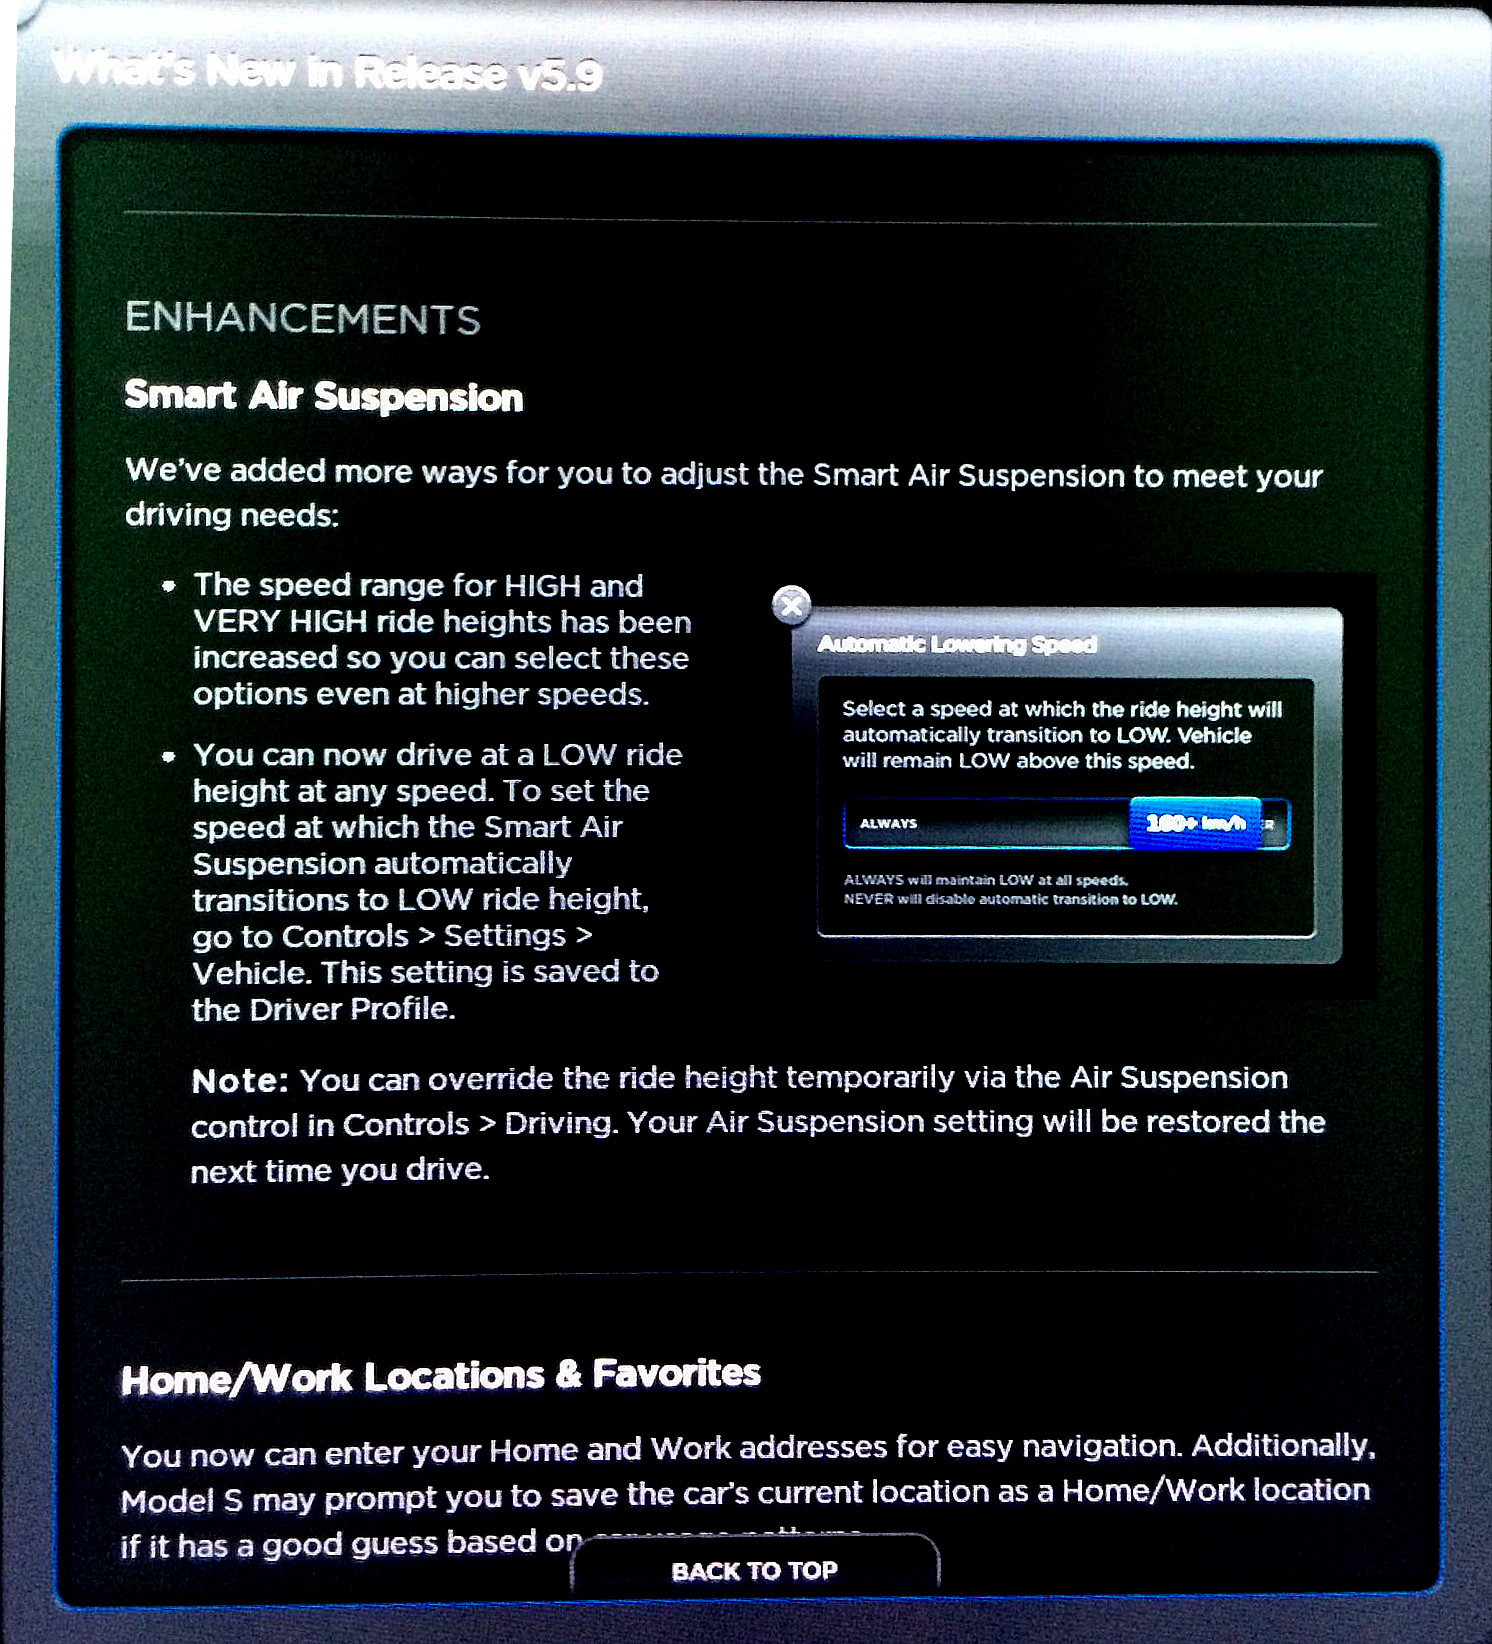 Tesla-Firmware-5-9-Smart-Air-Suspension